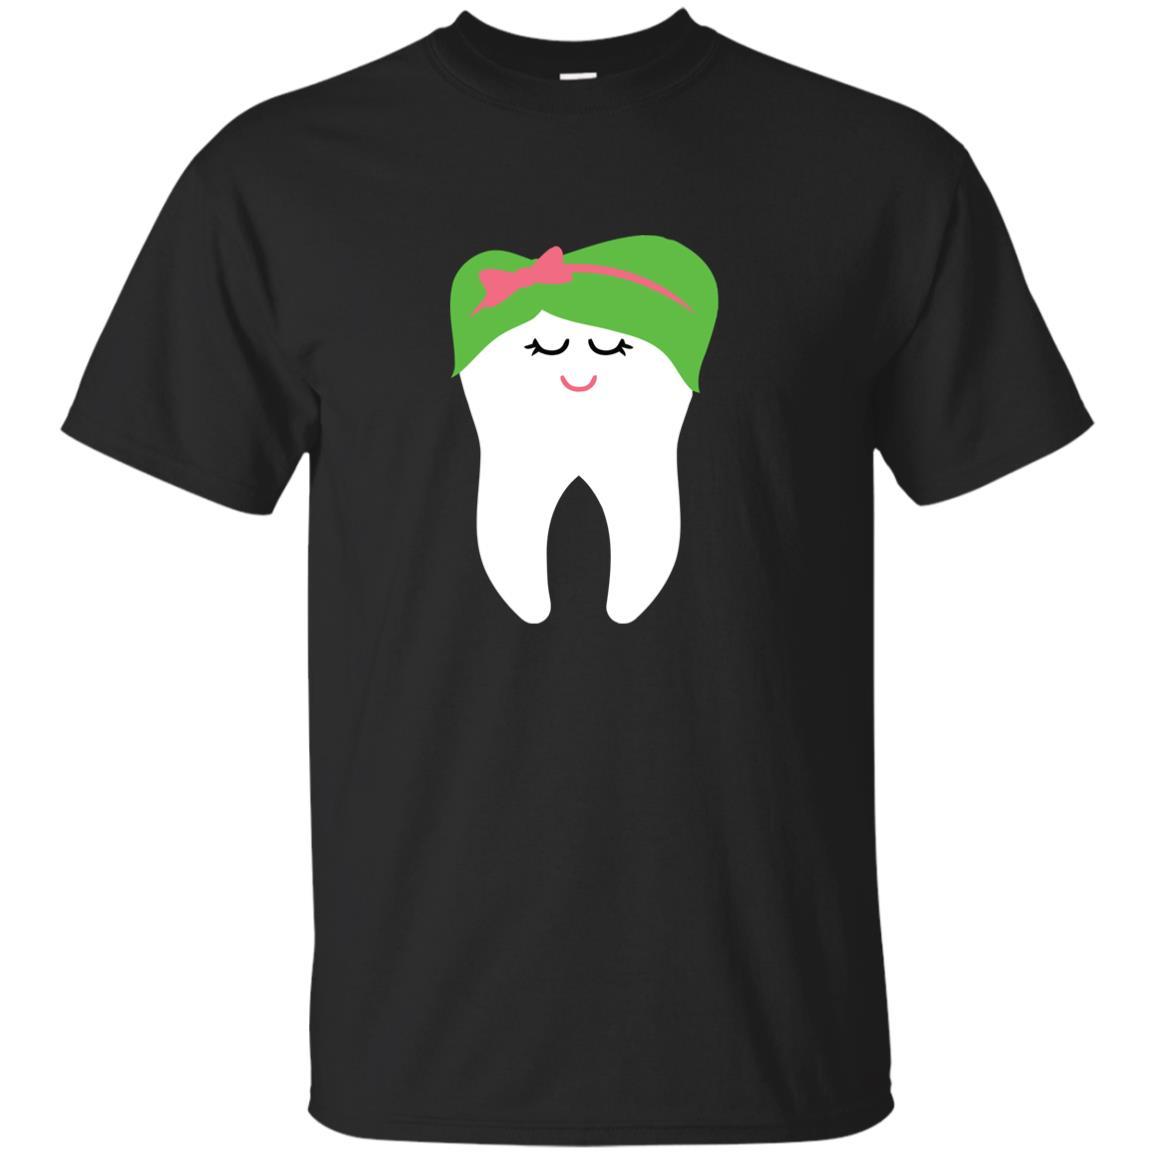 Dental Hygiene Funny Dentist-1 Unisex Short Sleeve